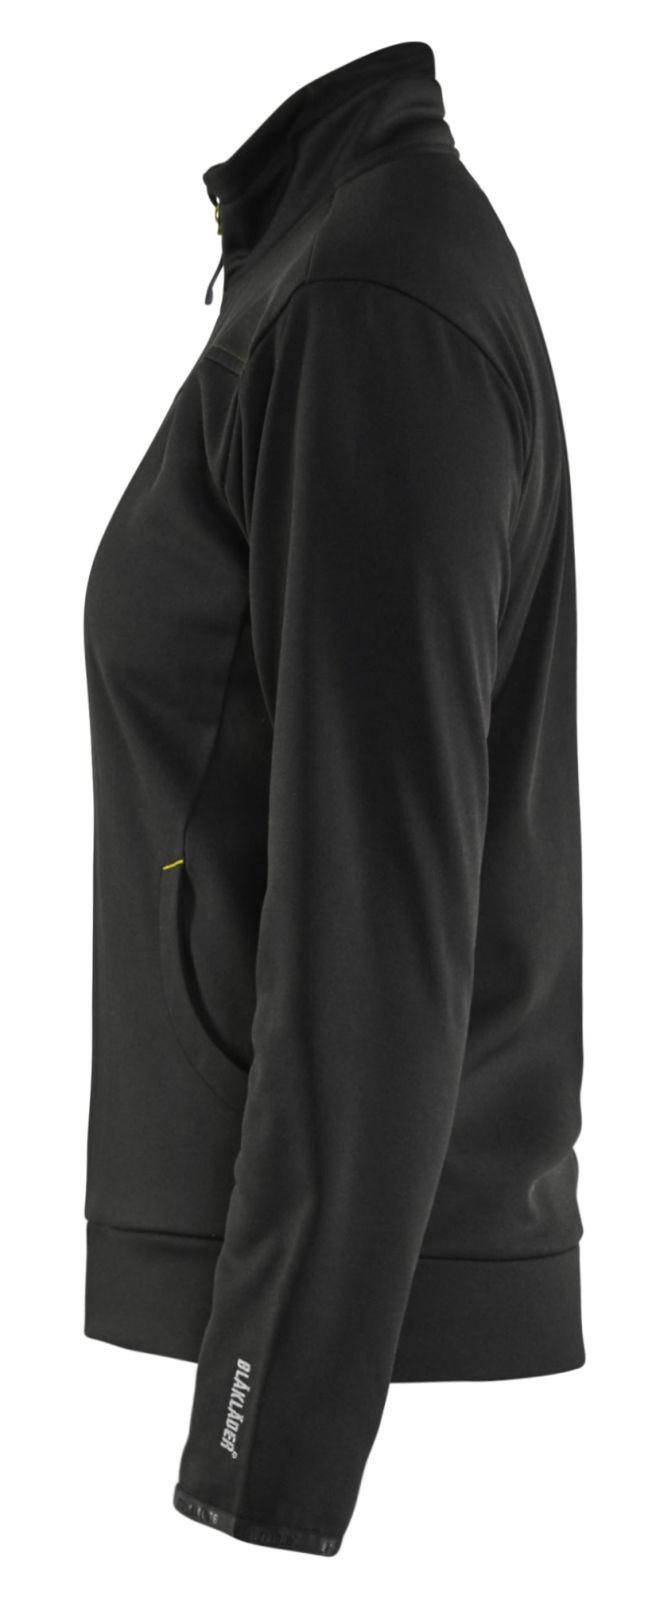 Blaklader Dames sweatvesten 33942526 zwart-fluo geel(9933)